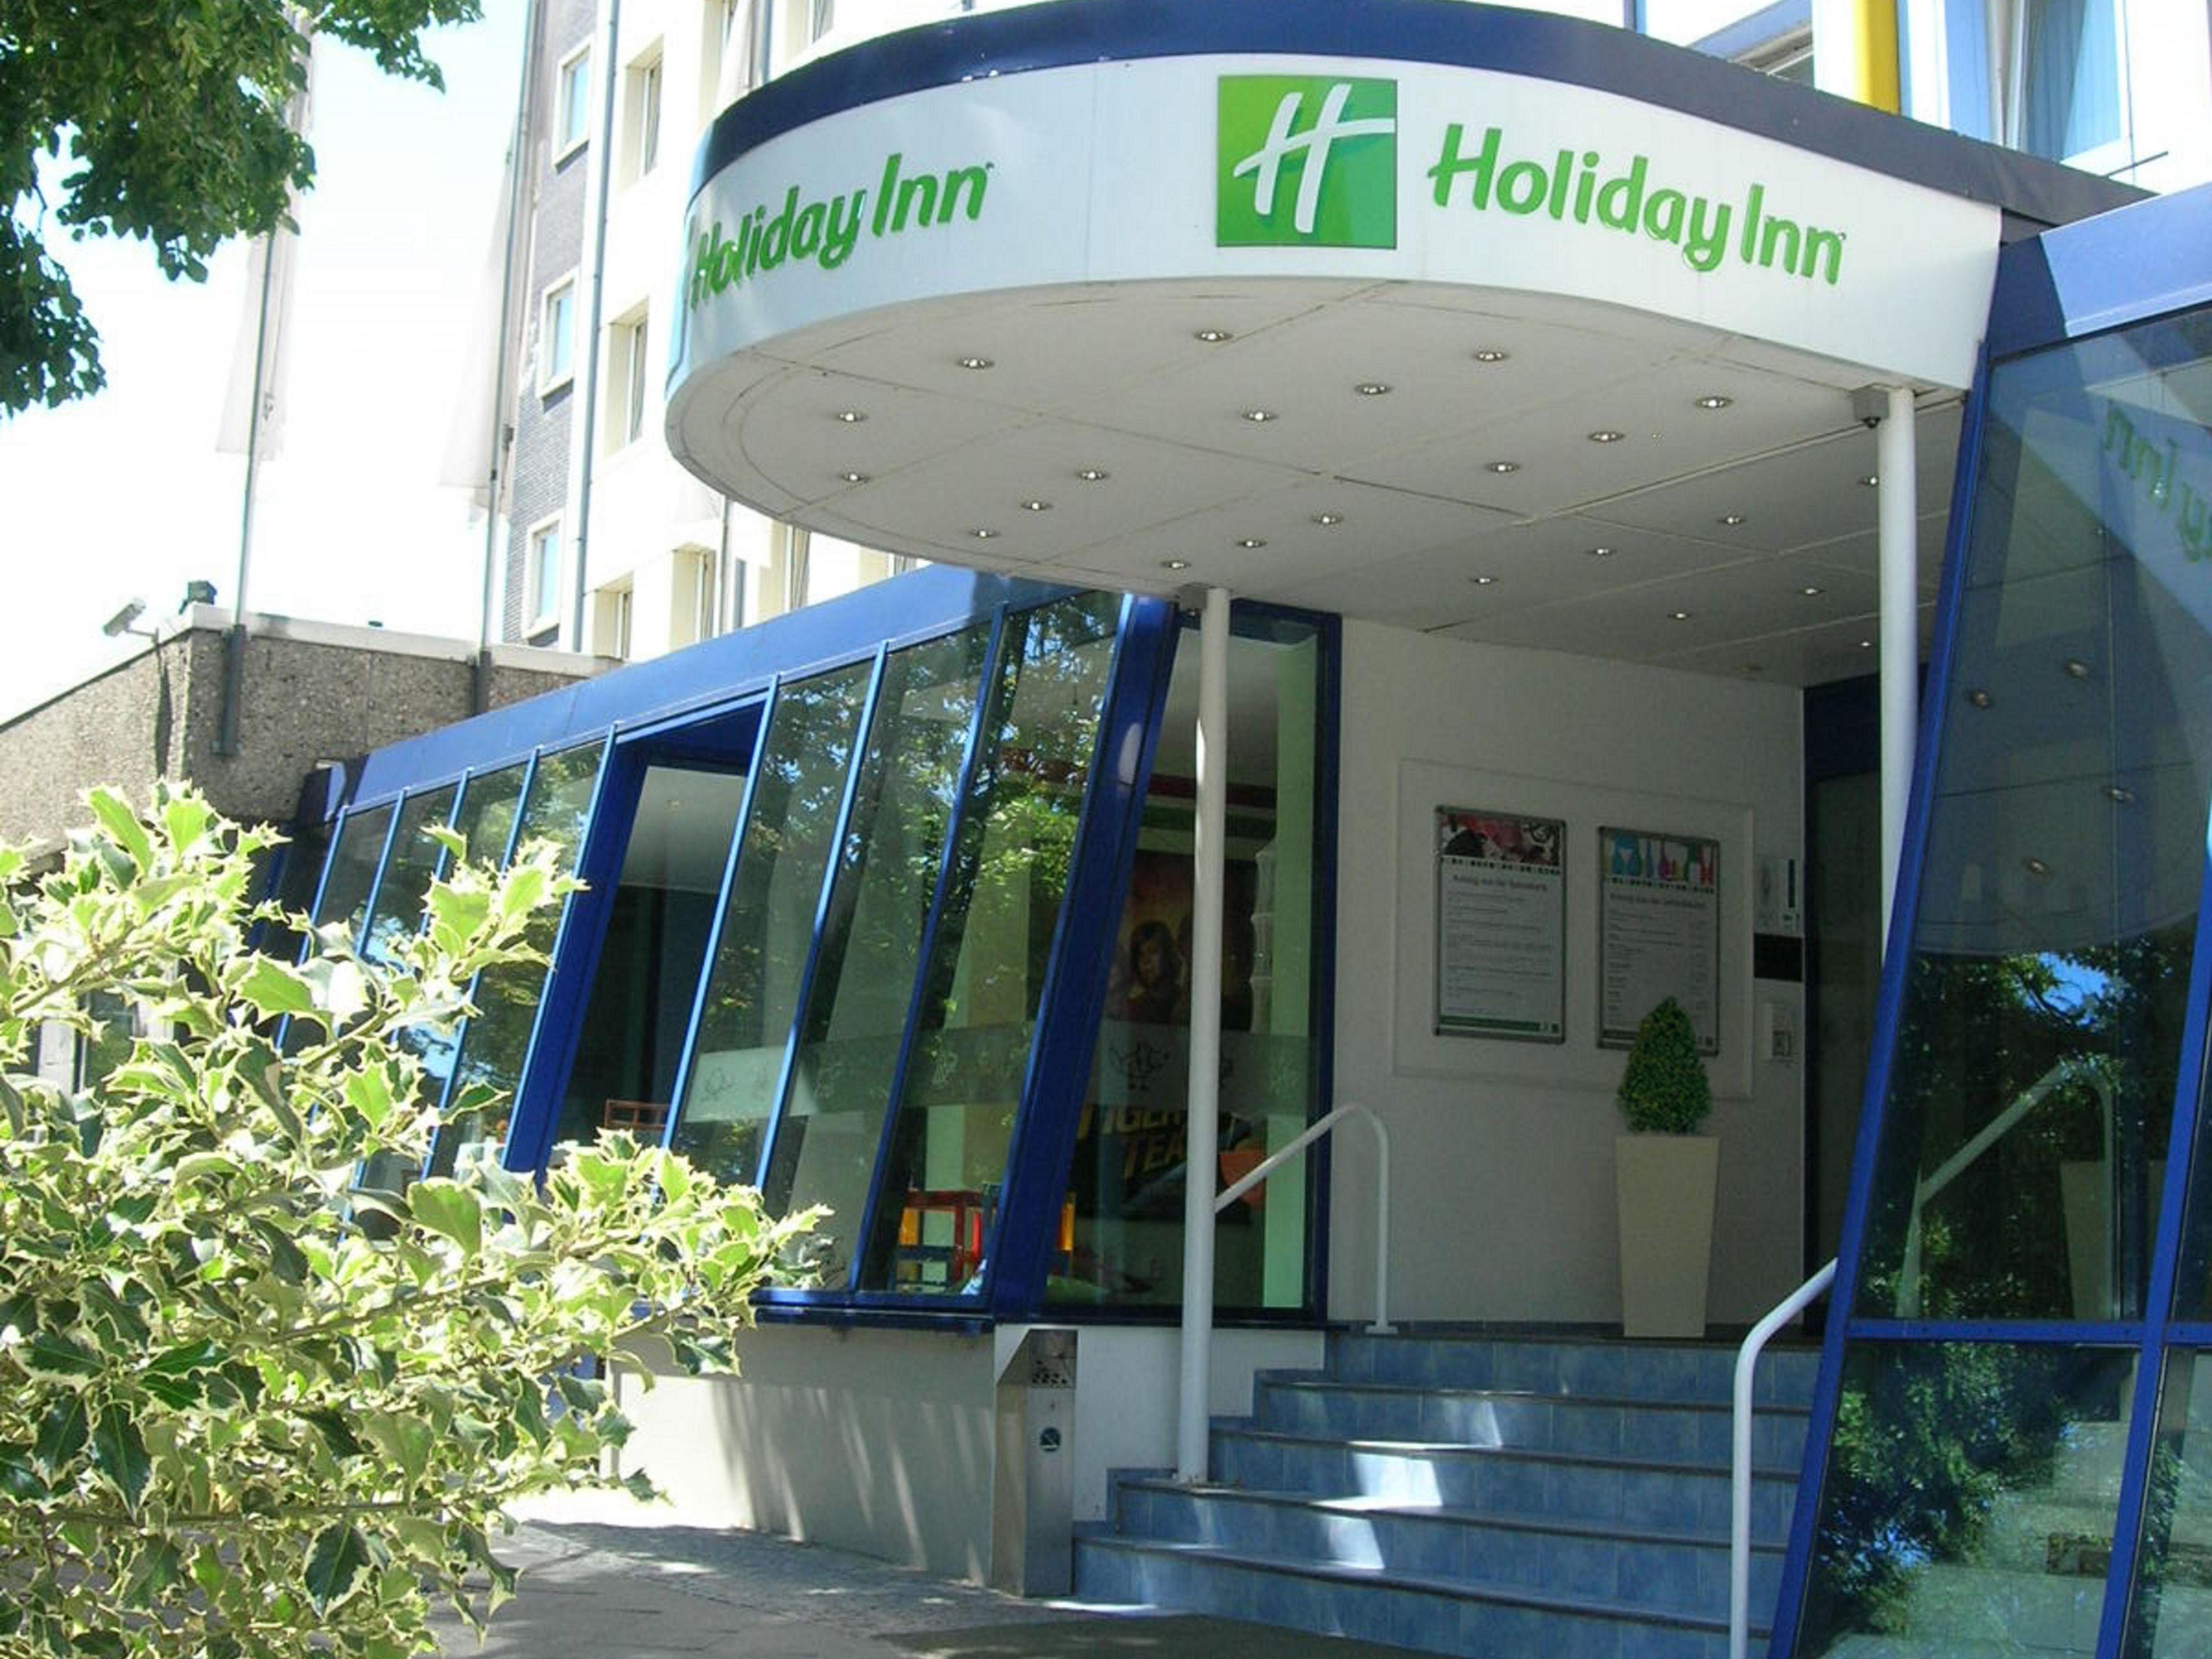 Hotel Holiday Inn Express Berlin City Centre